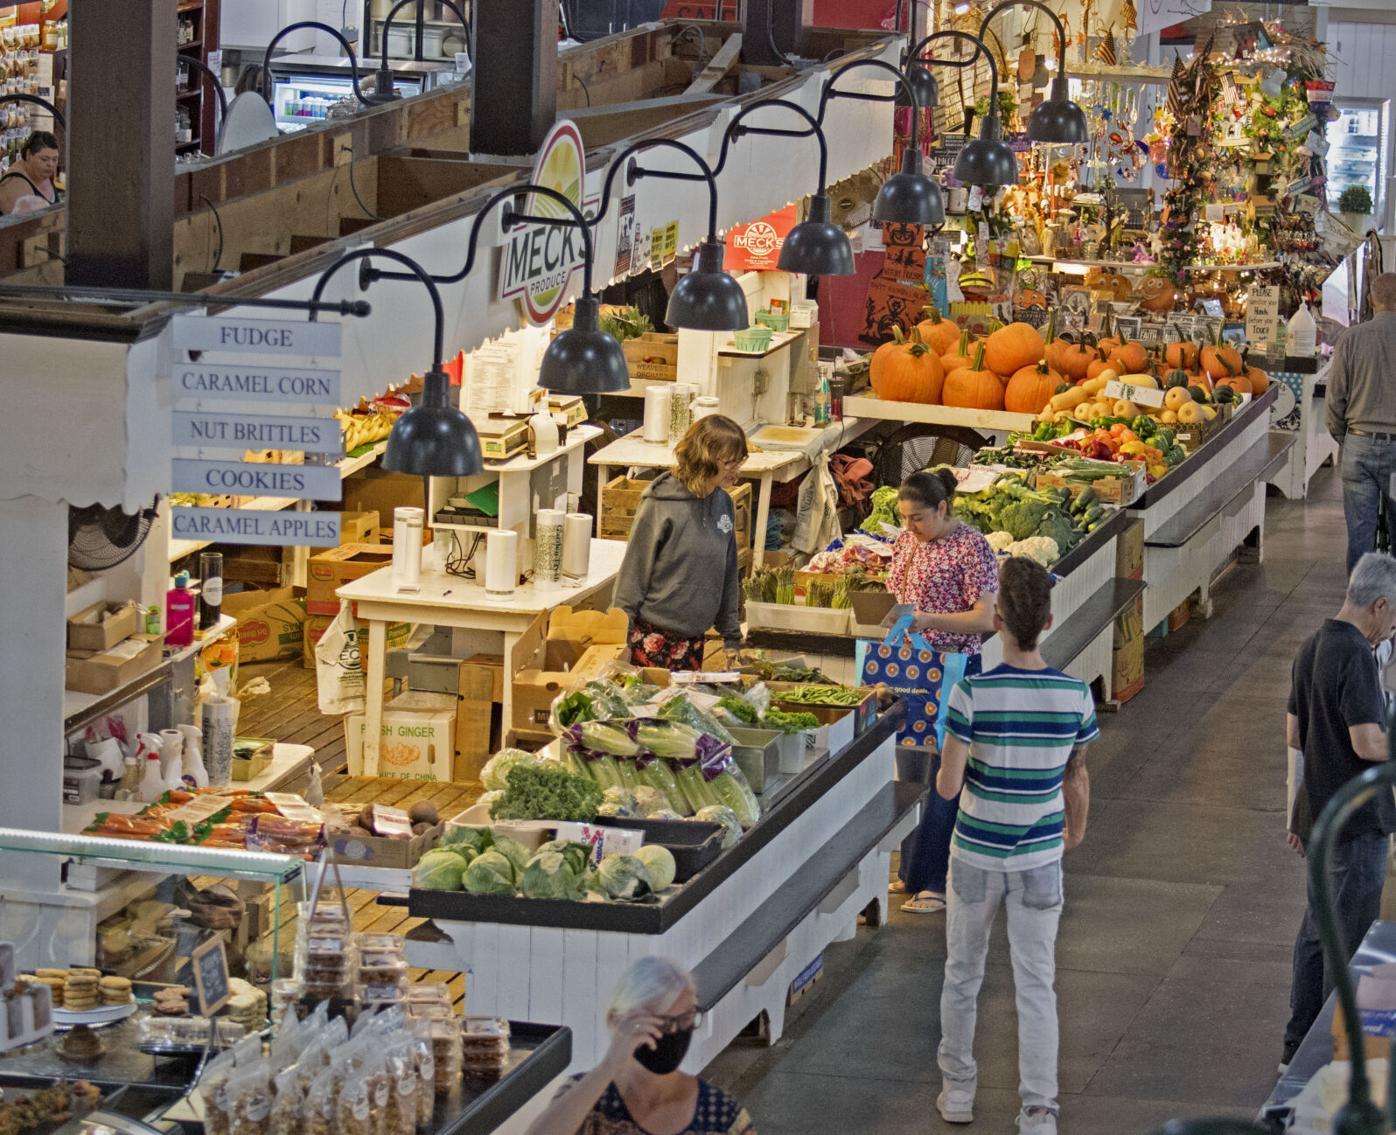 Meck's Central Market